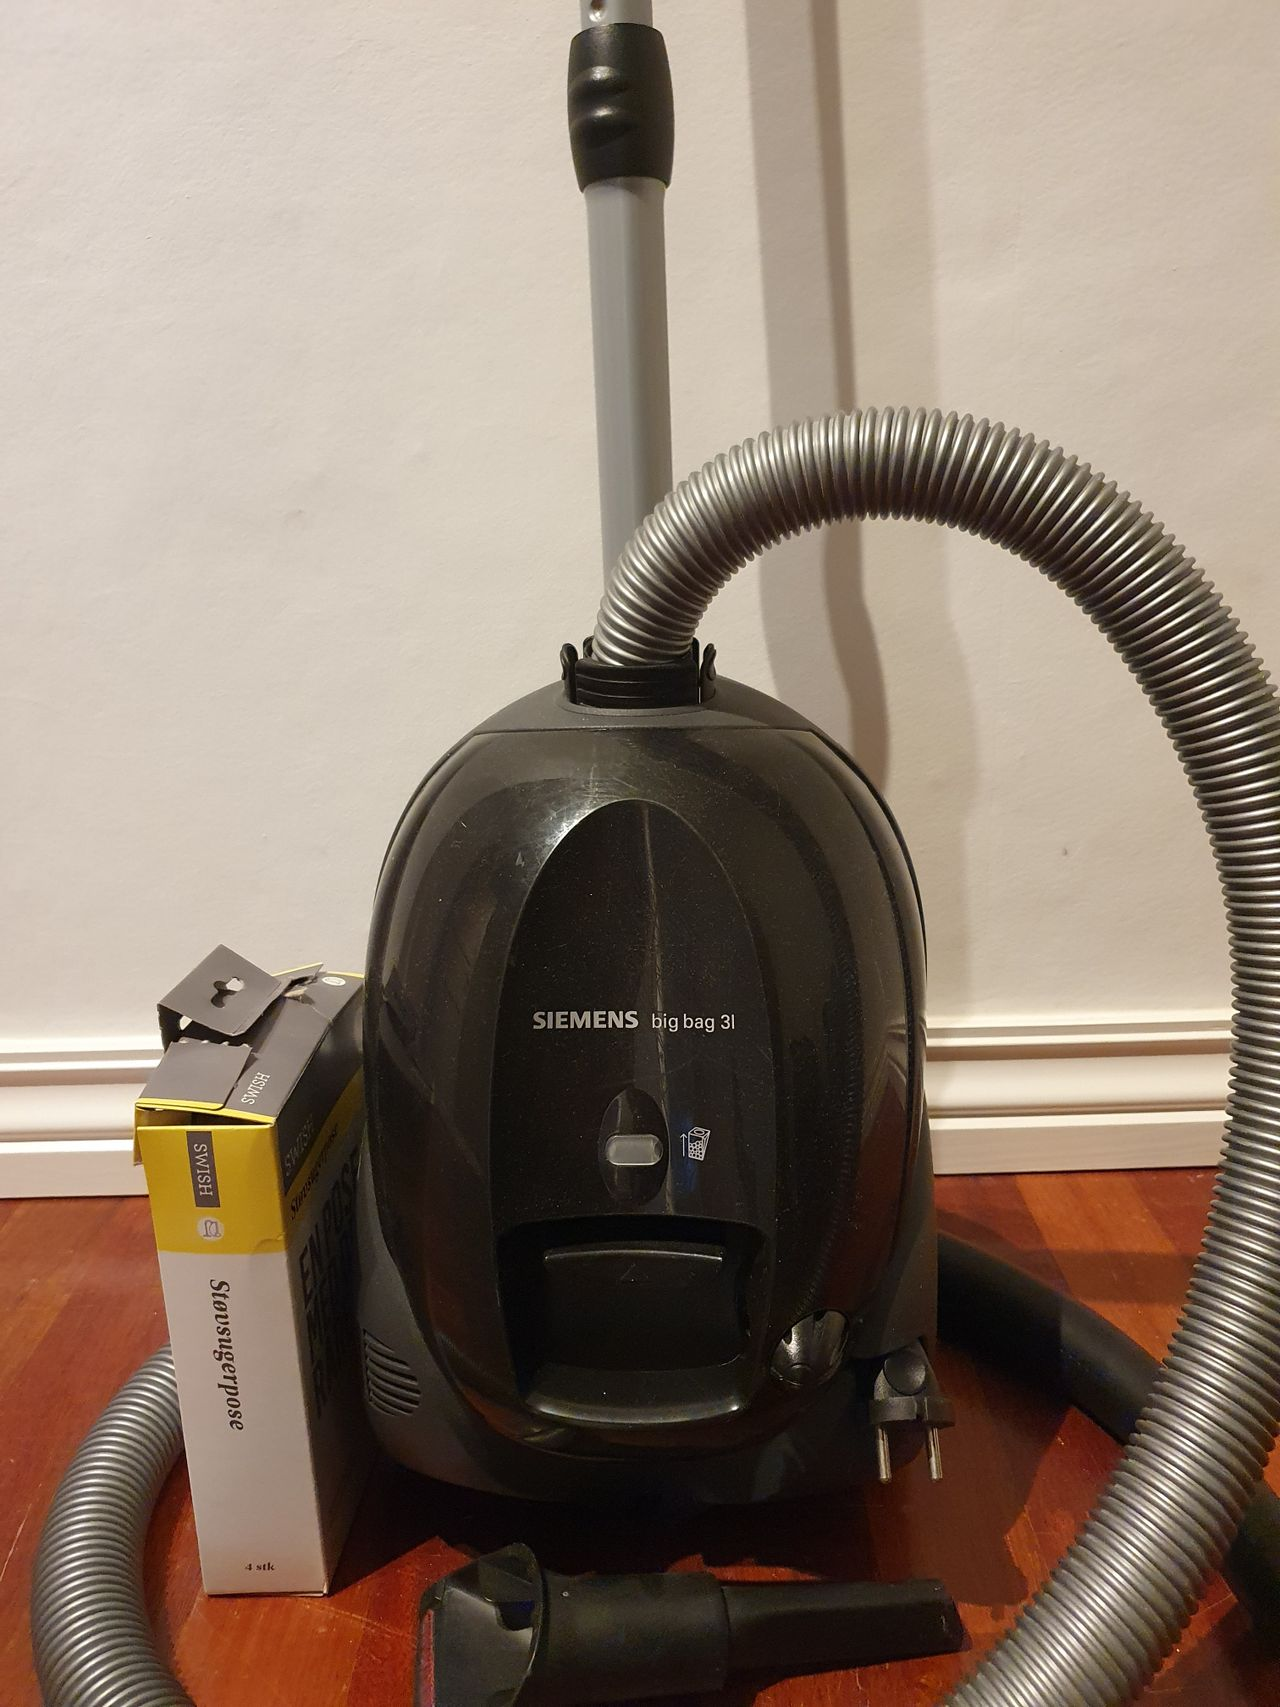 Simens BigBag 3l støvsuger | FINN.no